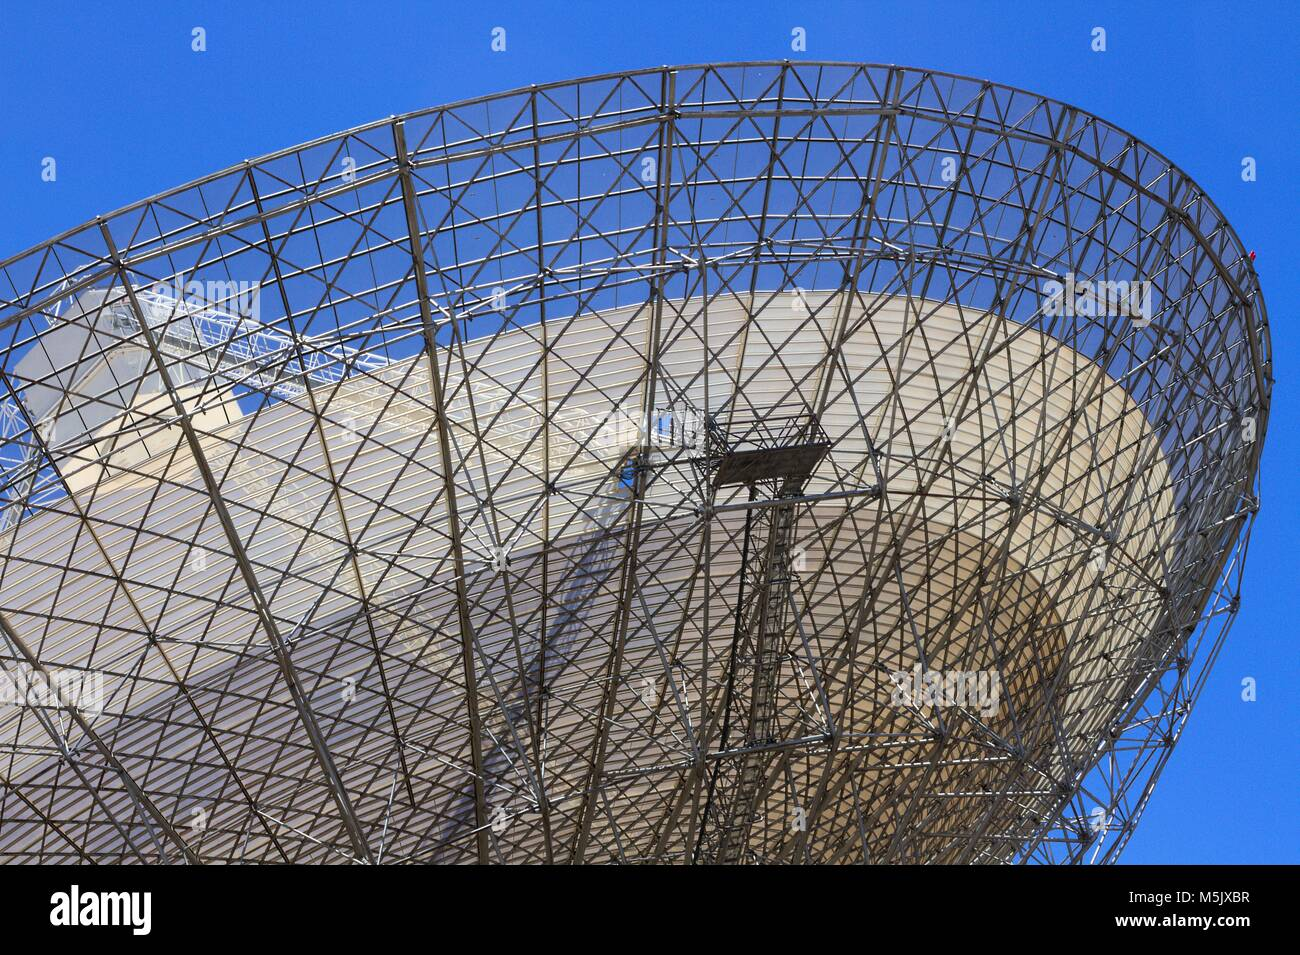 Radio telescope at Parkes, NSW, Australia. Stock Photo